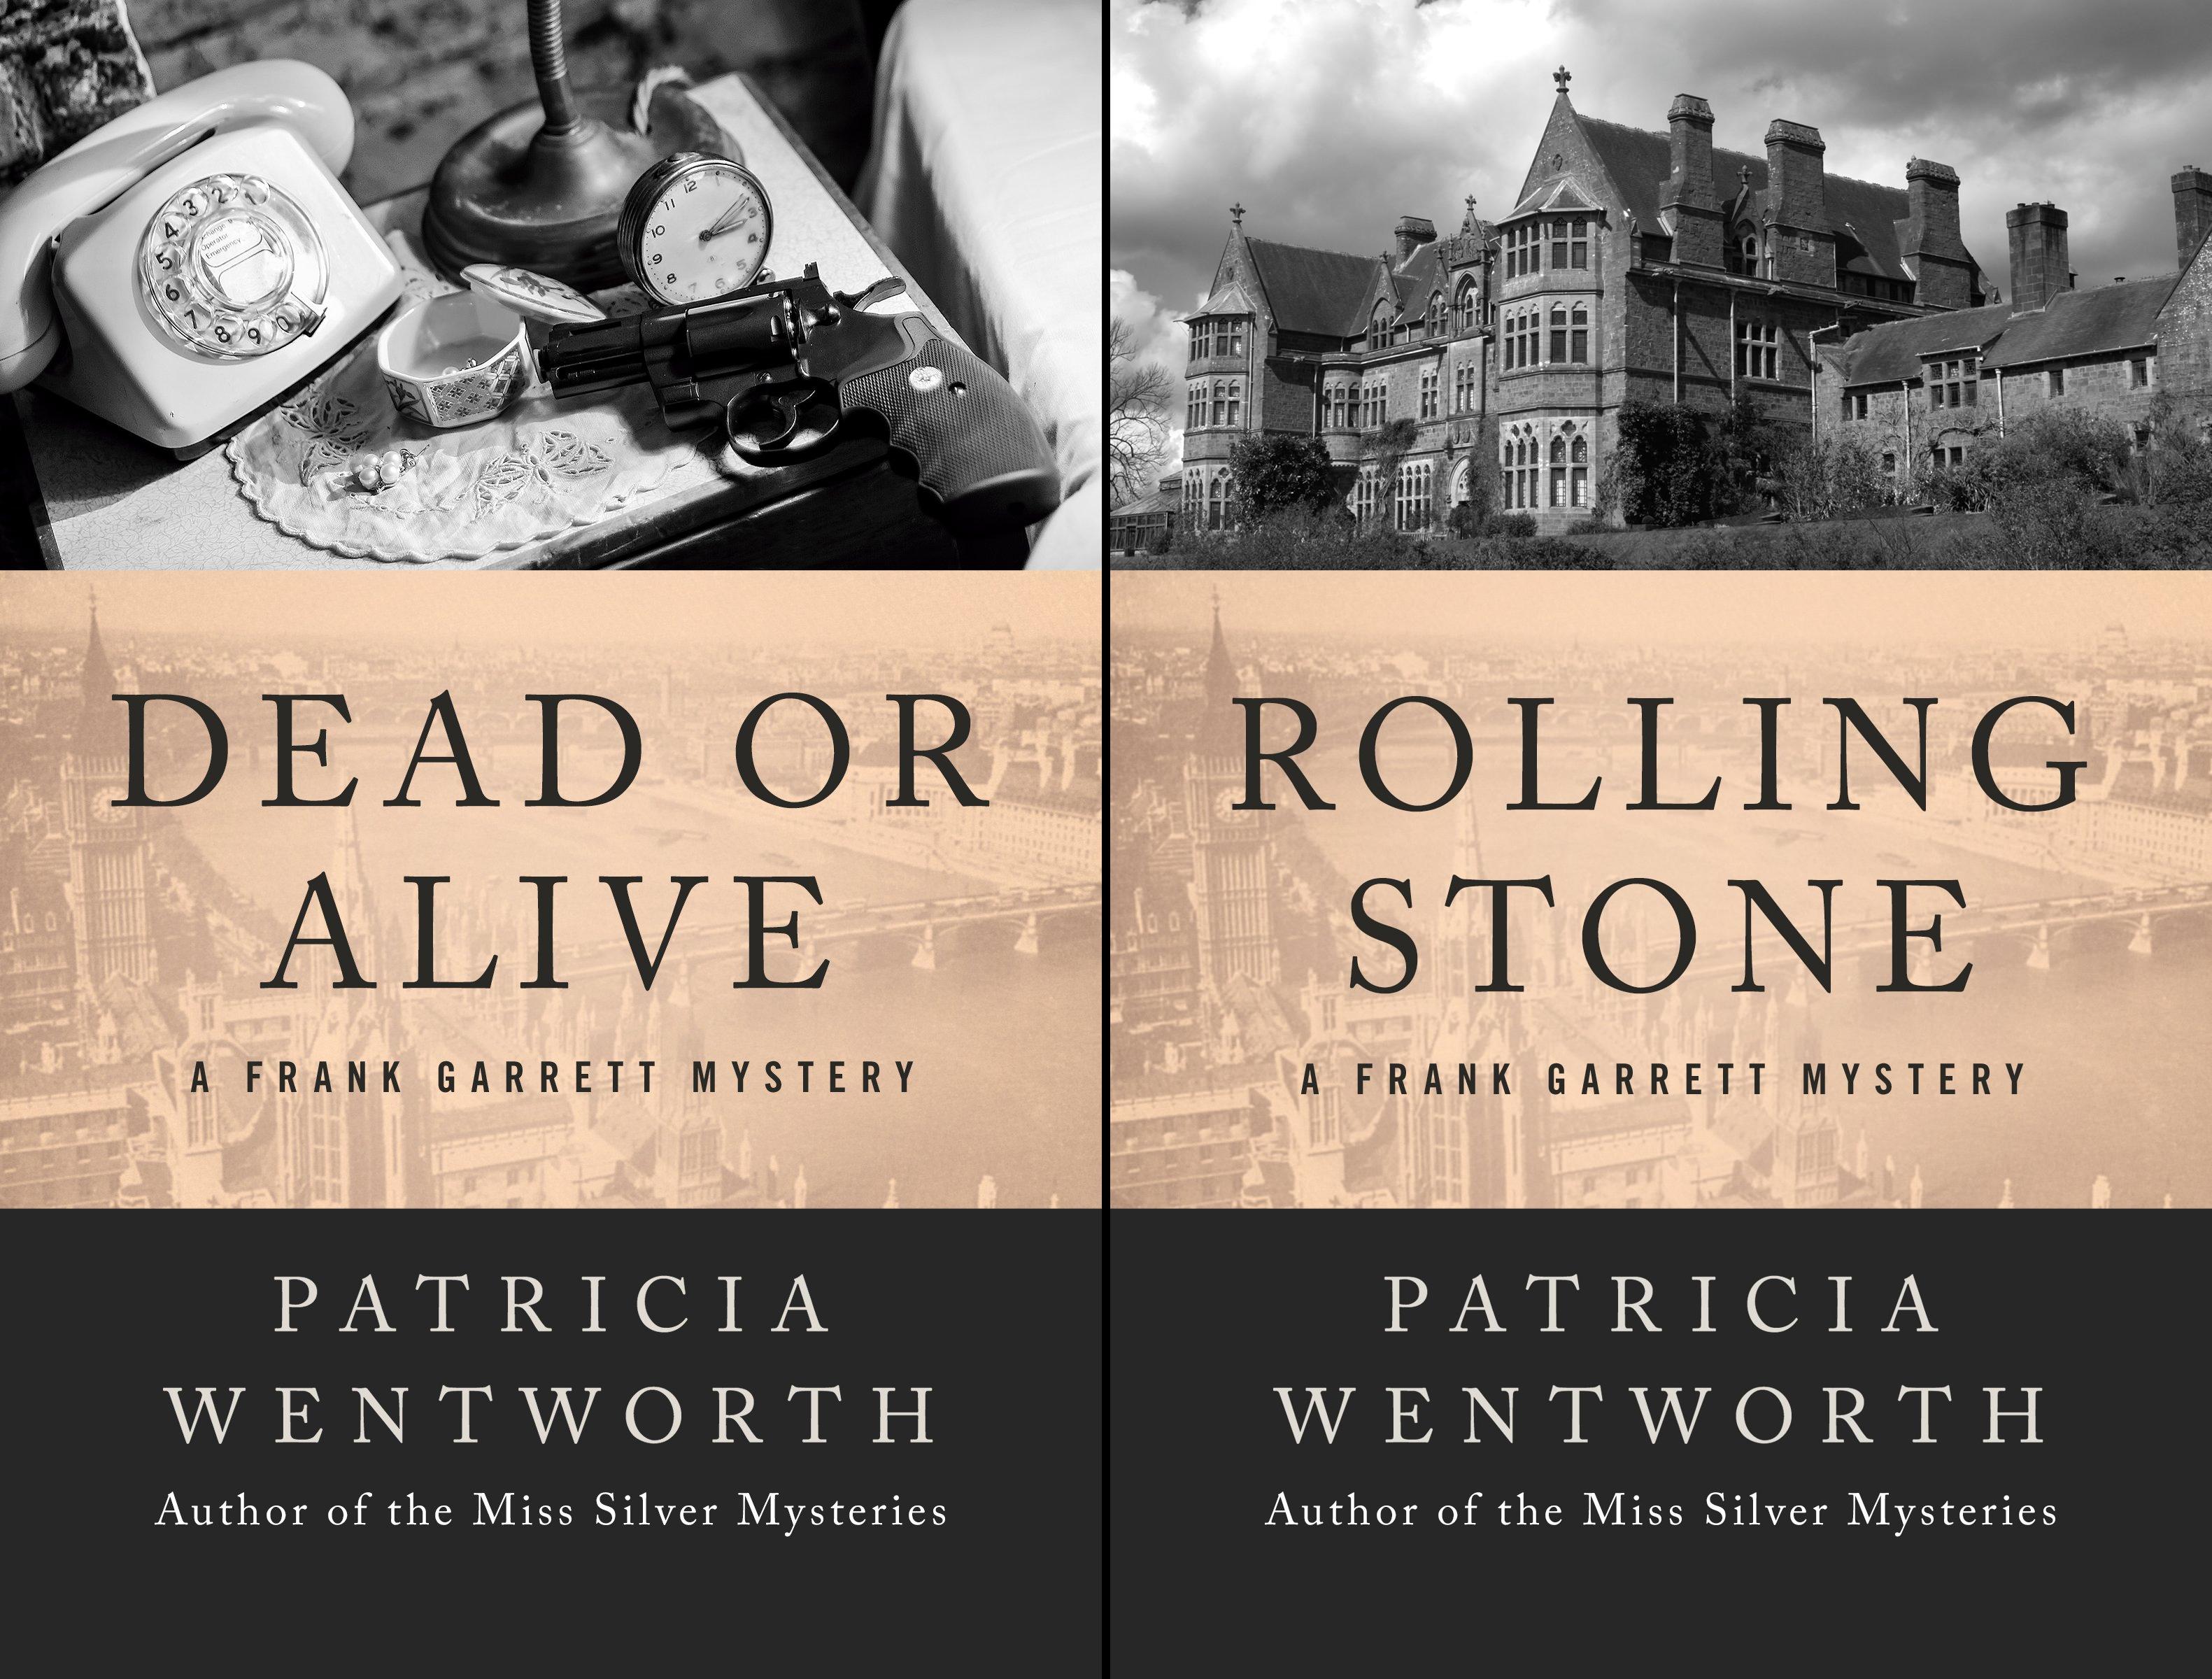 The Frank Garrett Mysteries (2 Book Series)